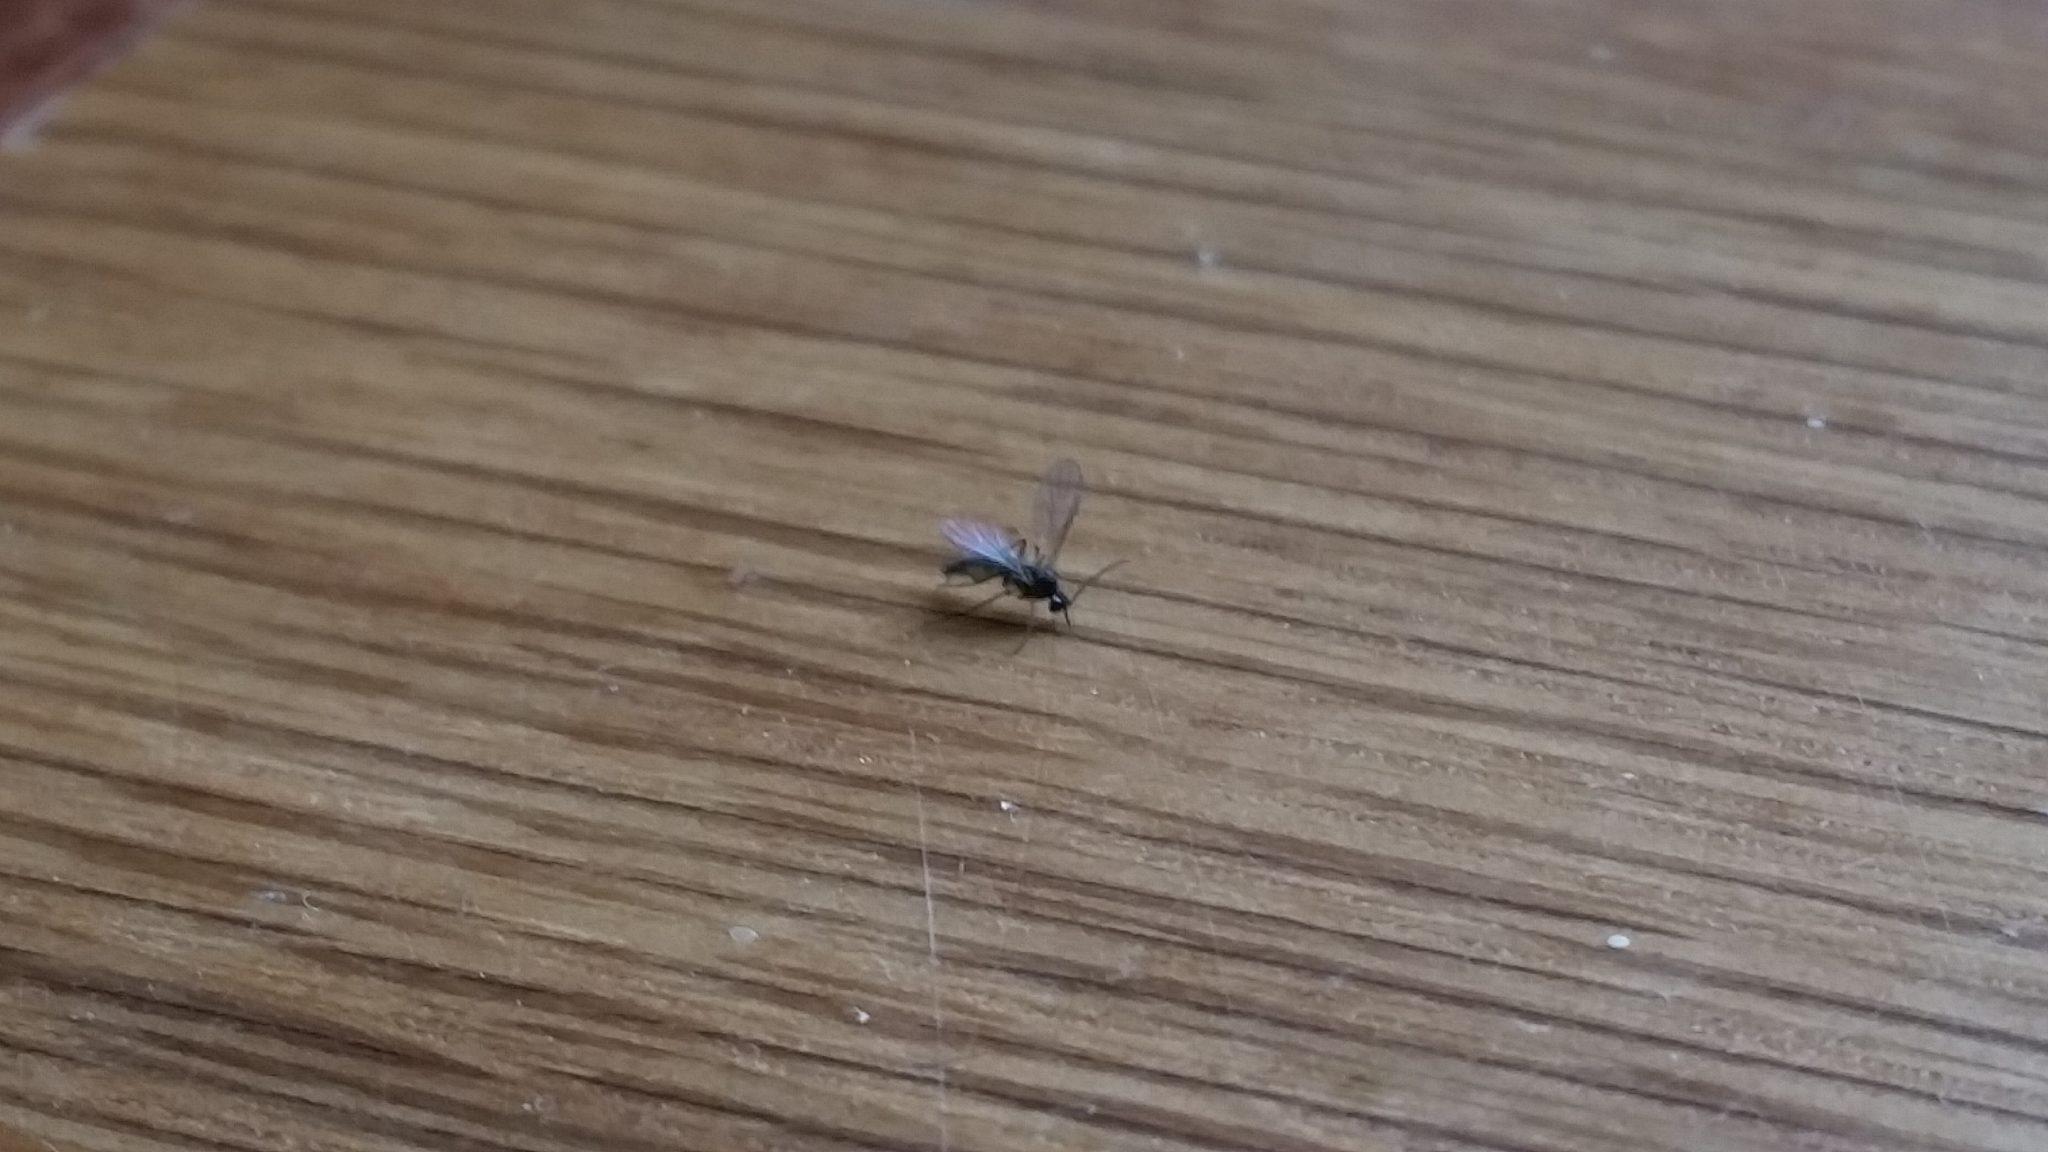 fungus gnat living